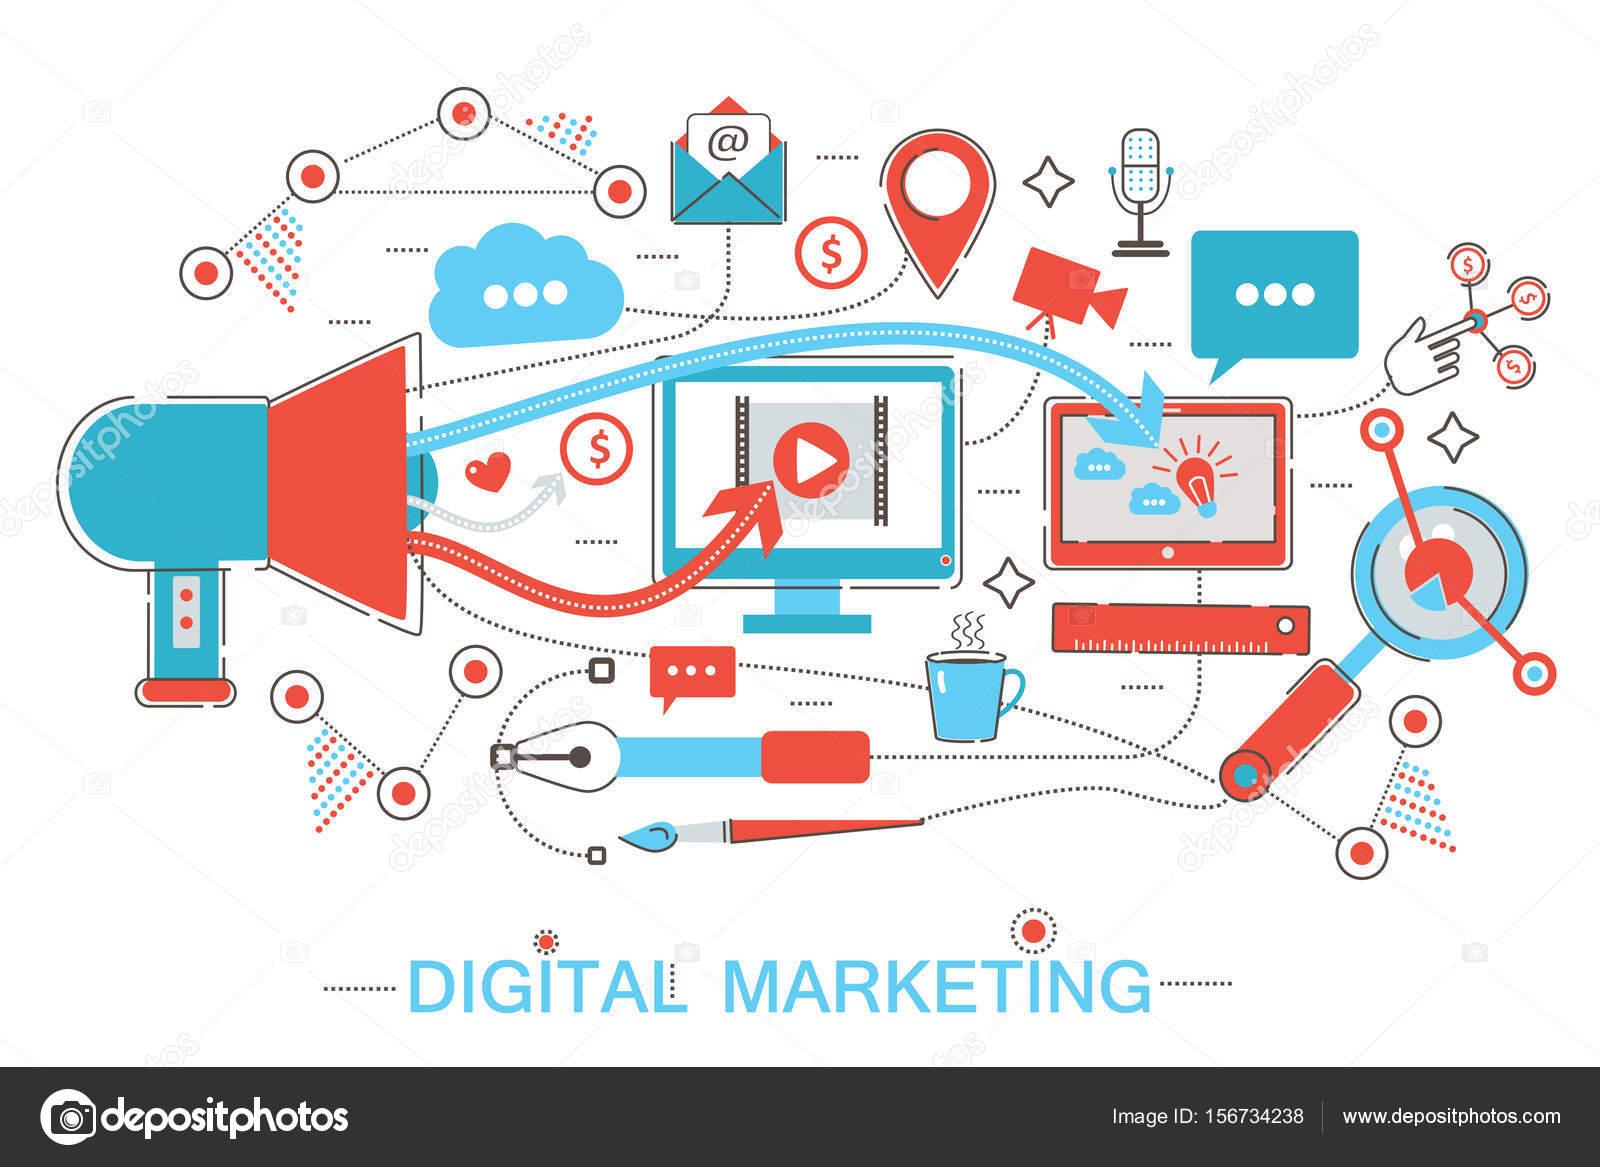 Tarjetas digitales en línea Marketing Digital online y red social